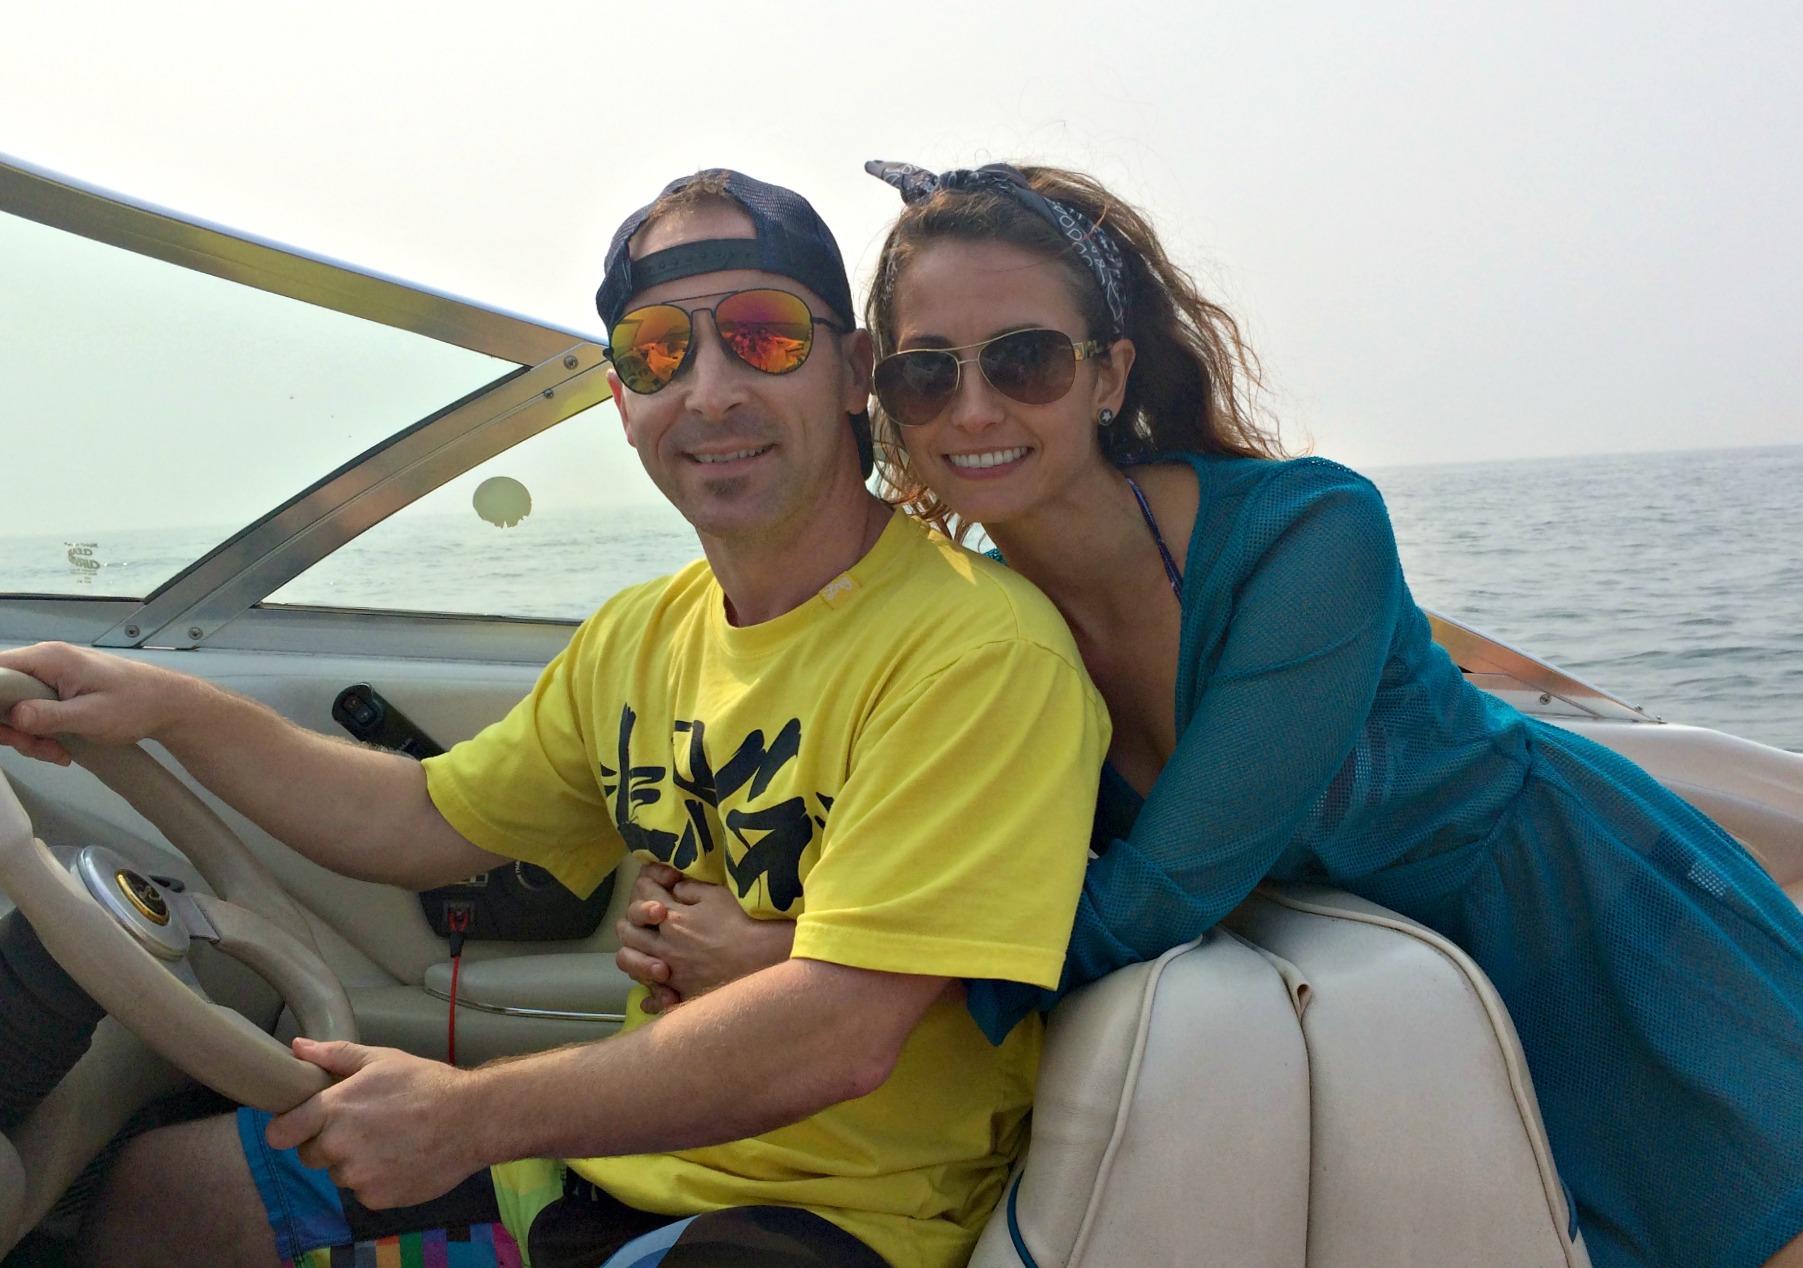 Scott and I on the boat, Lake Michigan